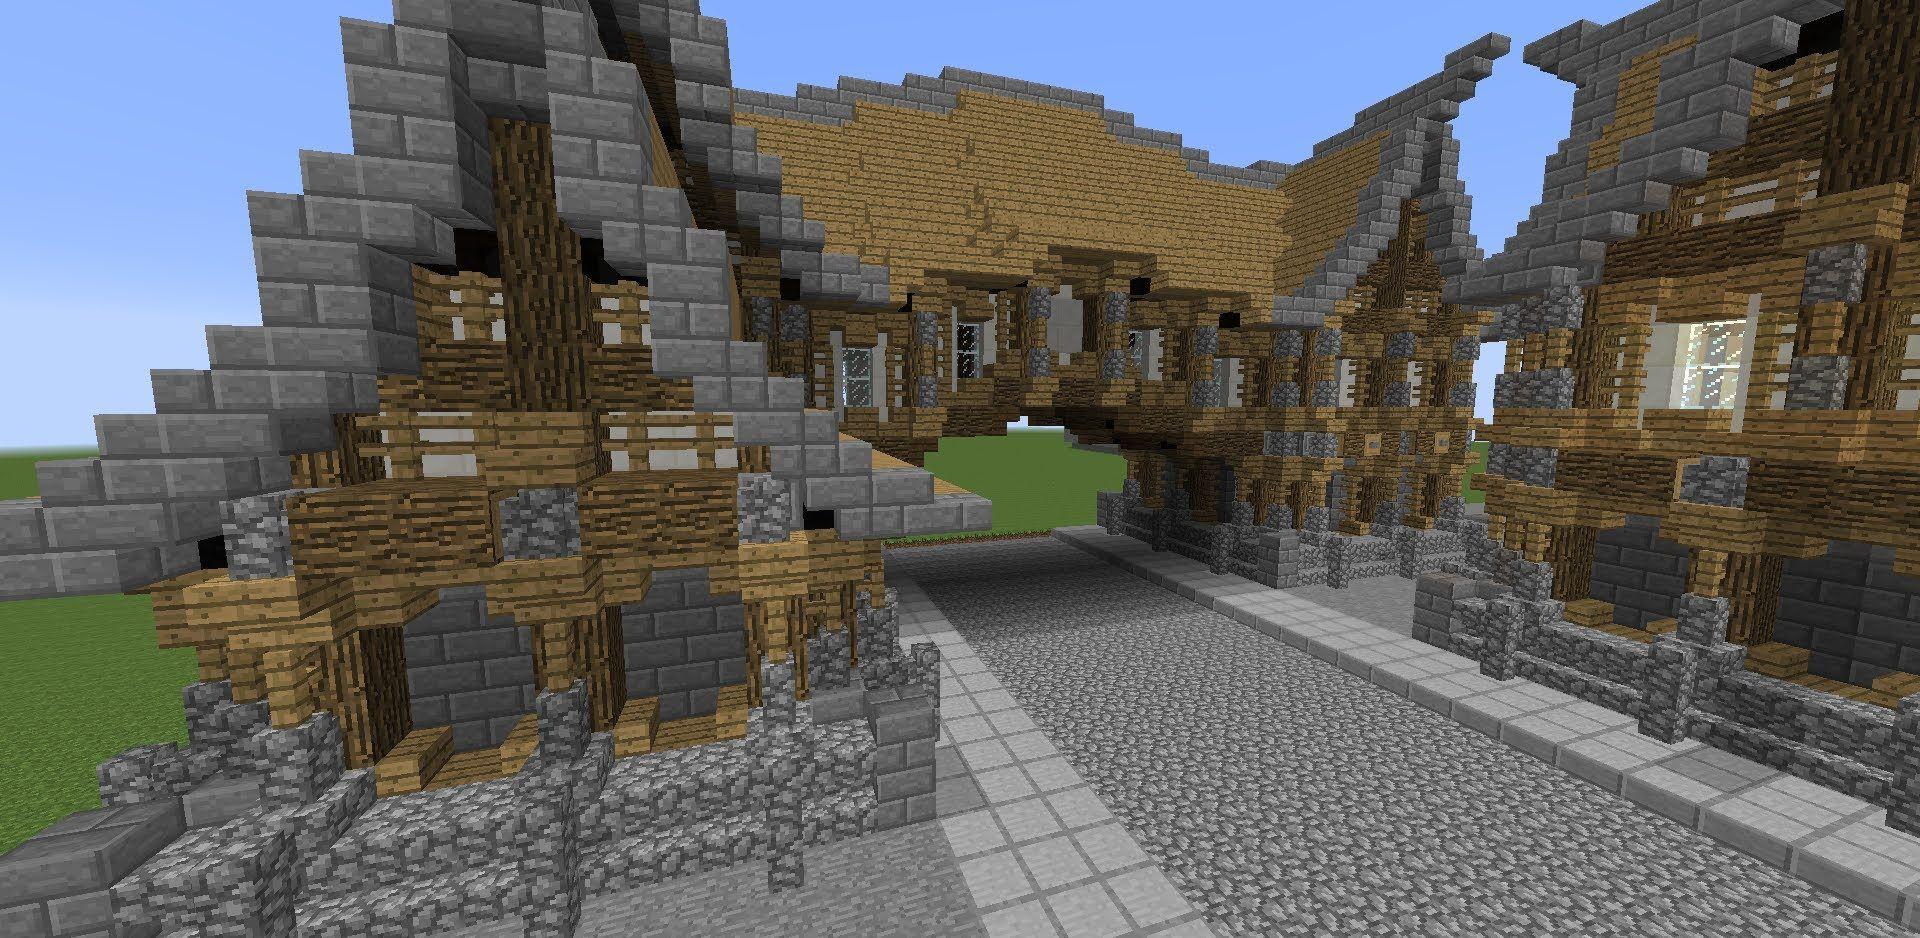 Minecraft Tutorial Medieval Hanging Street Building How To Build A Med Minecraft Medieval Minecraft Tutorial Minecraft Blueprints